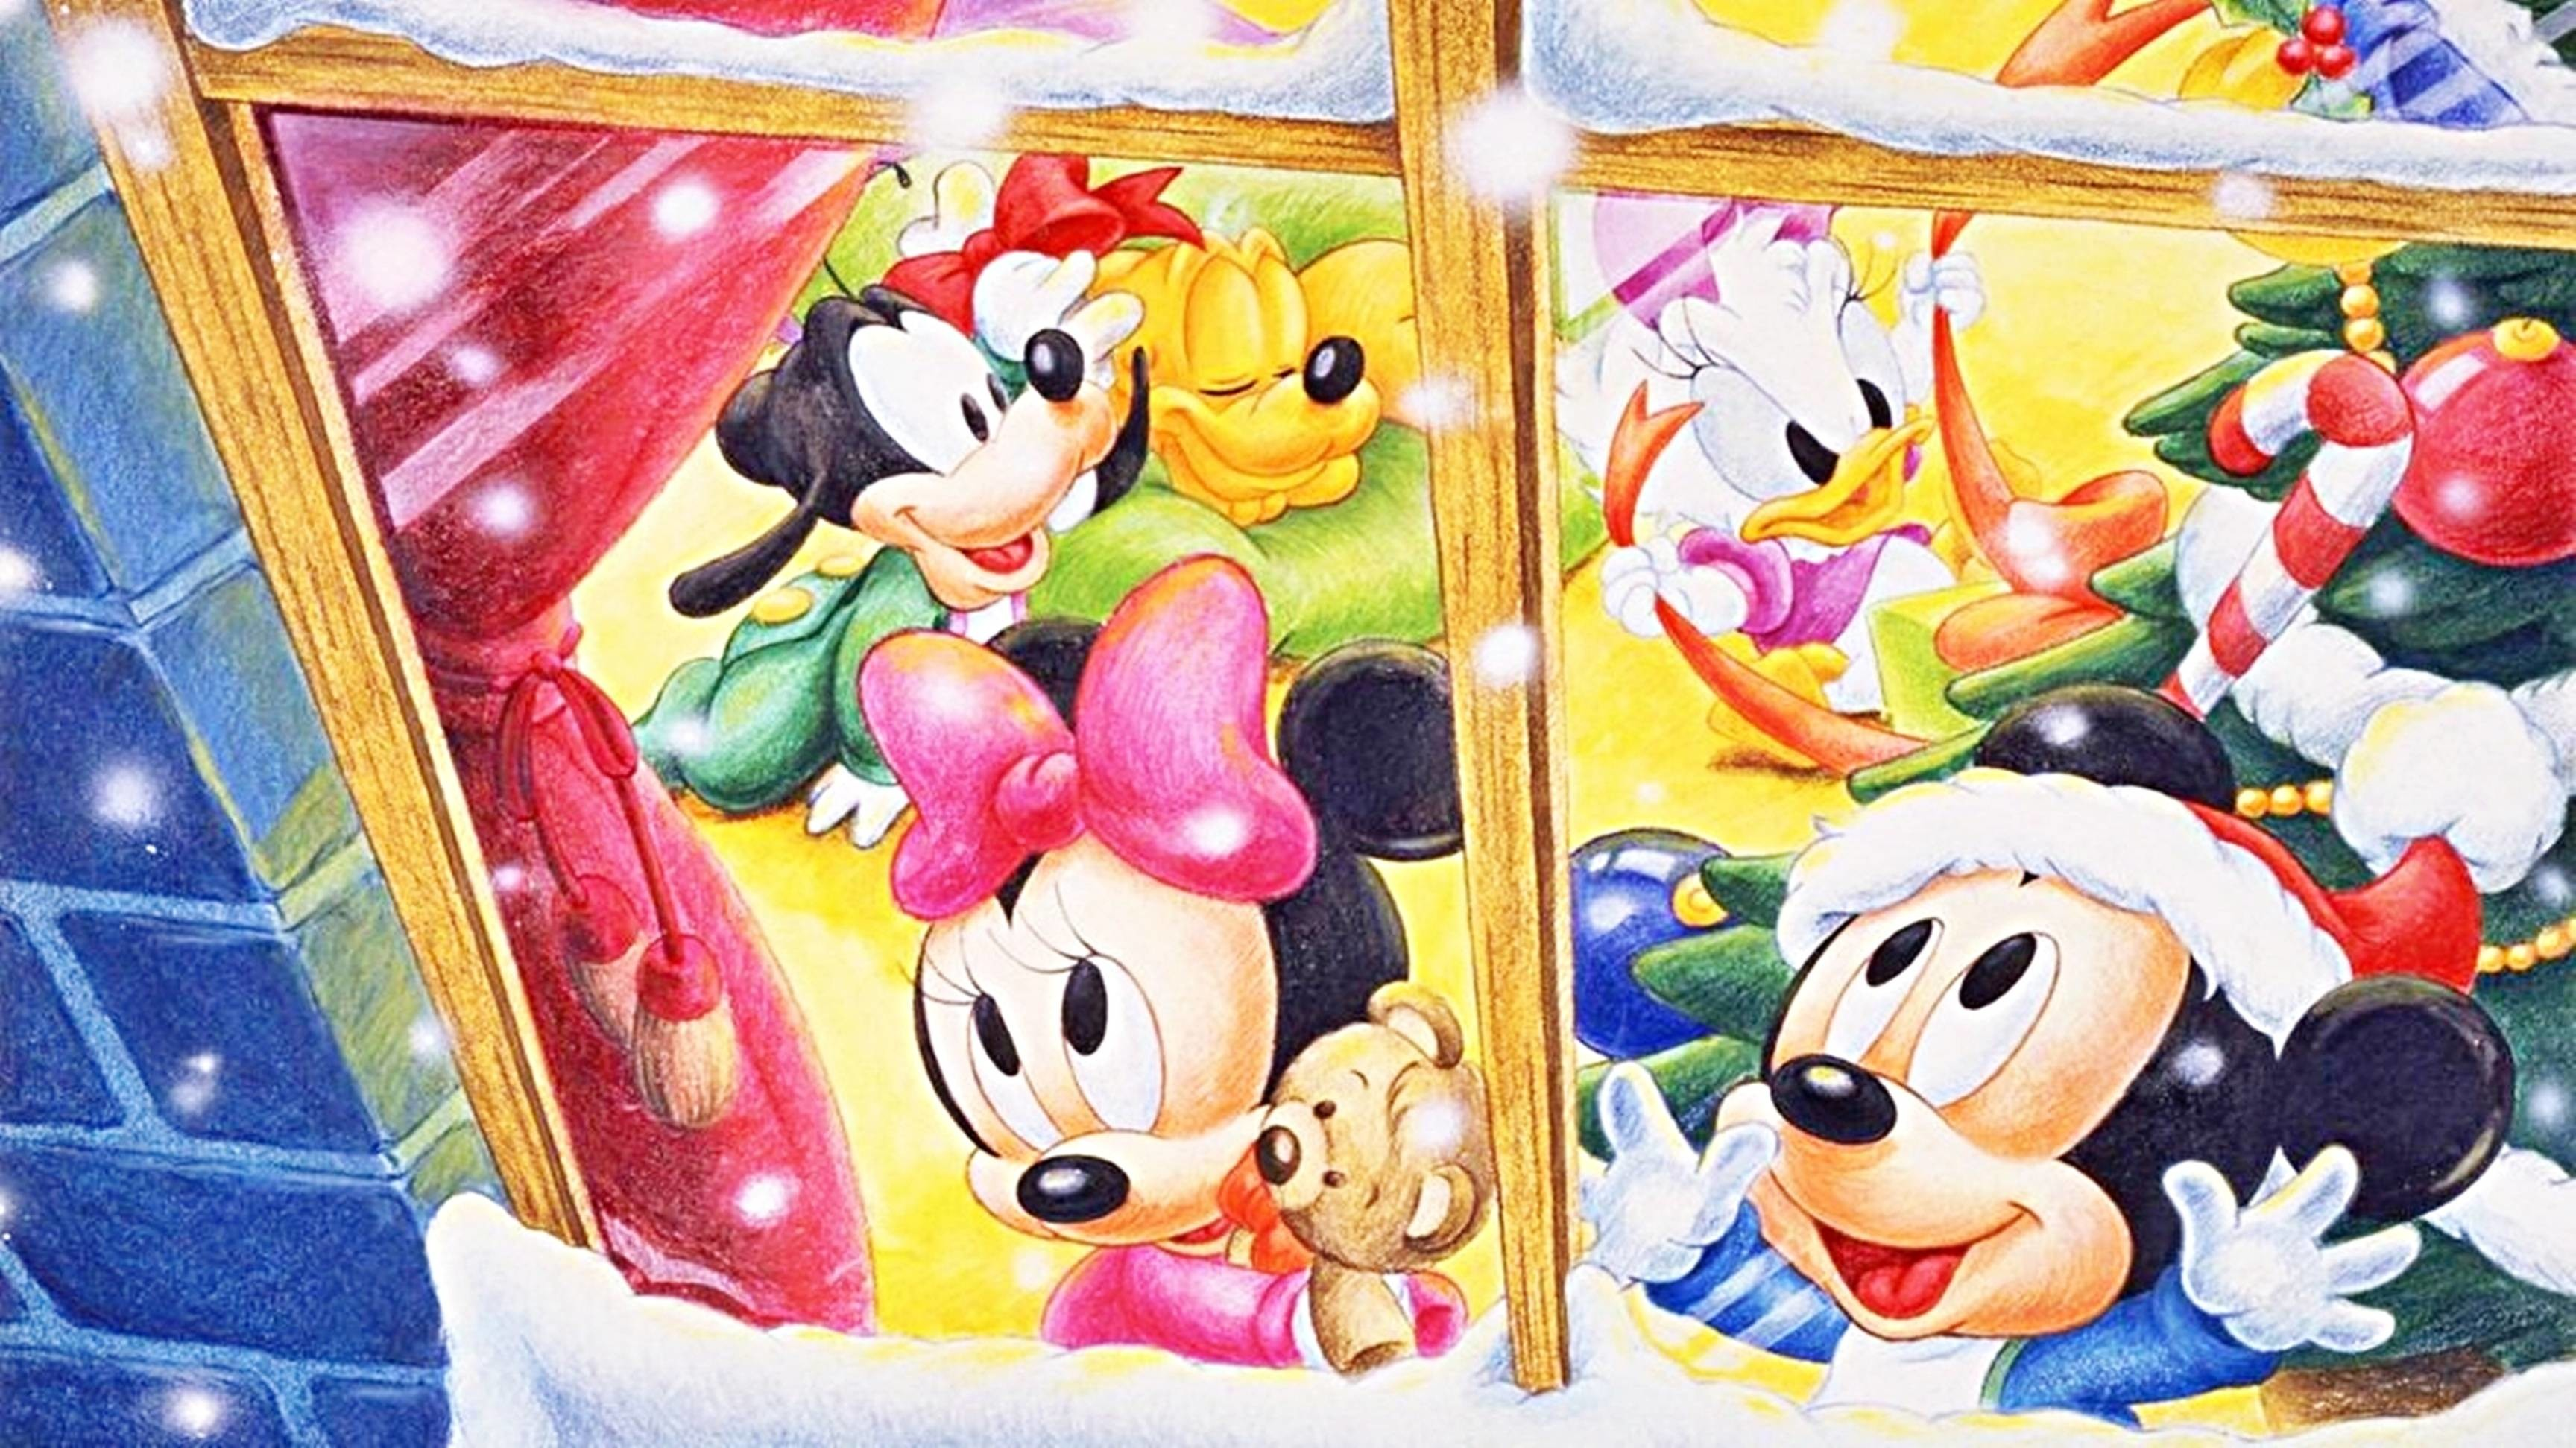 Disney Christmas Wallpaper Desktop - Christmas Wallpaper Walt Disney , HD Wallpaper & Backgrounds